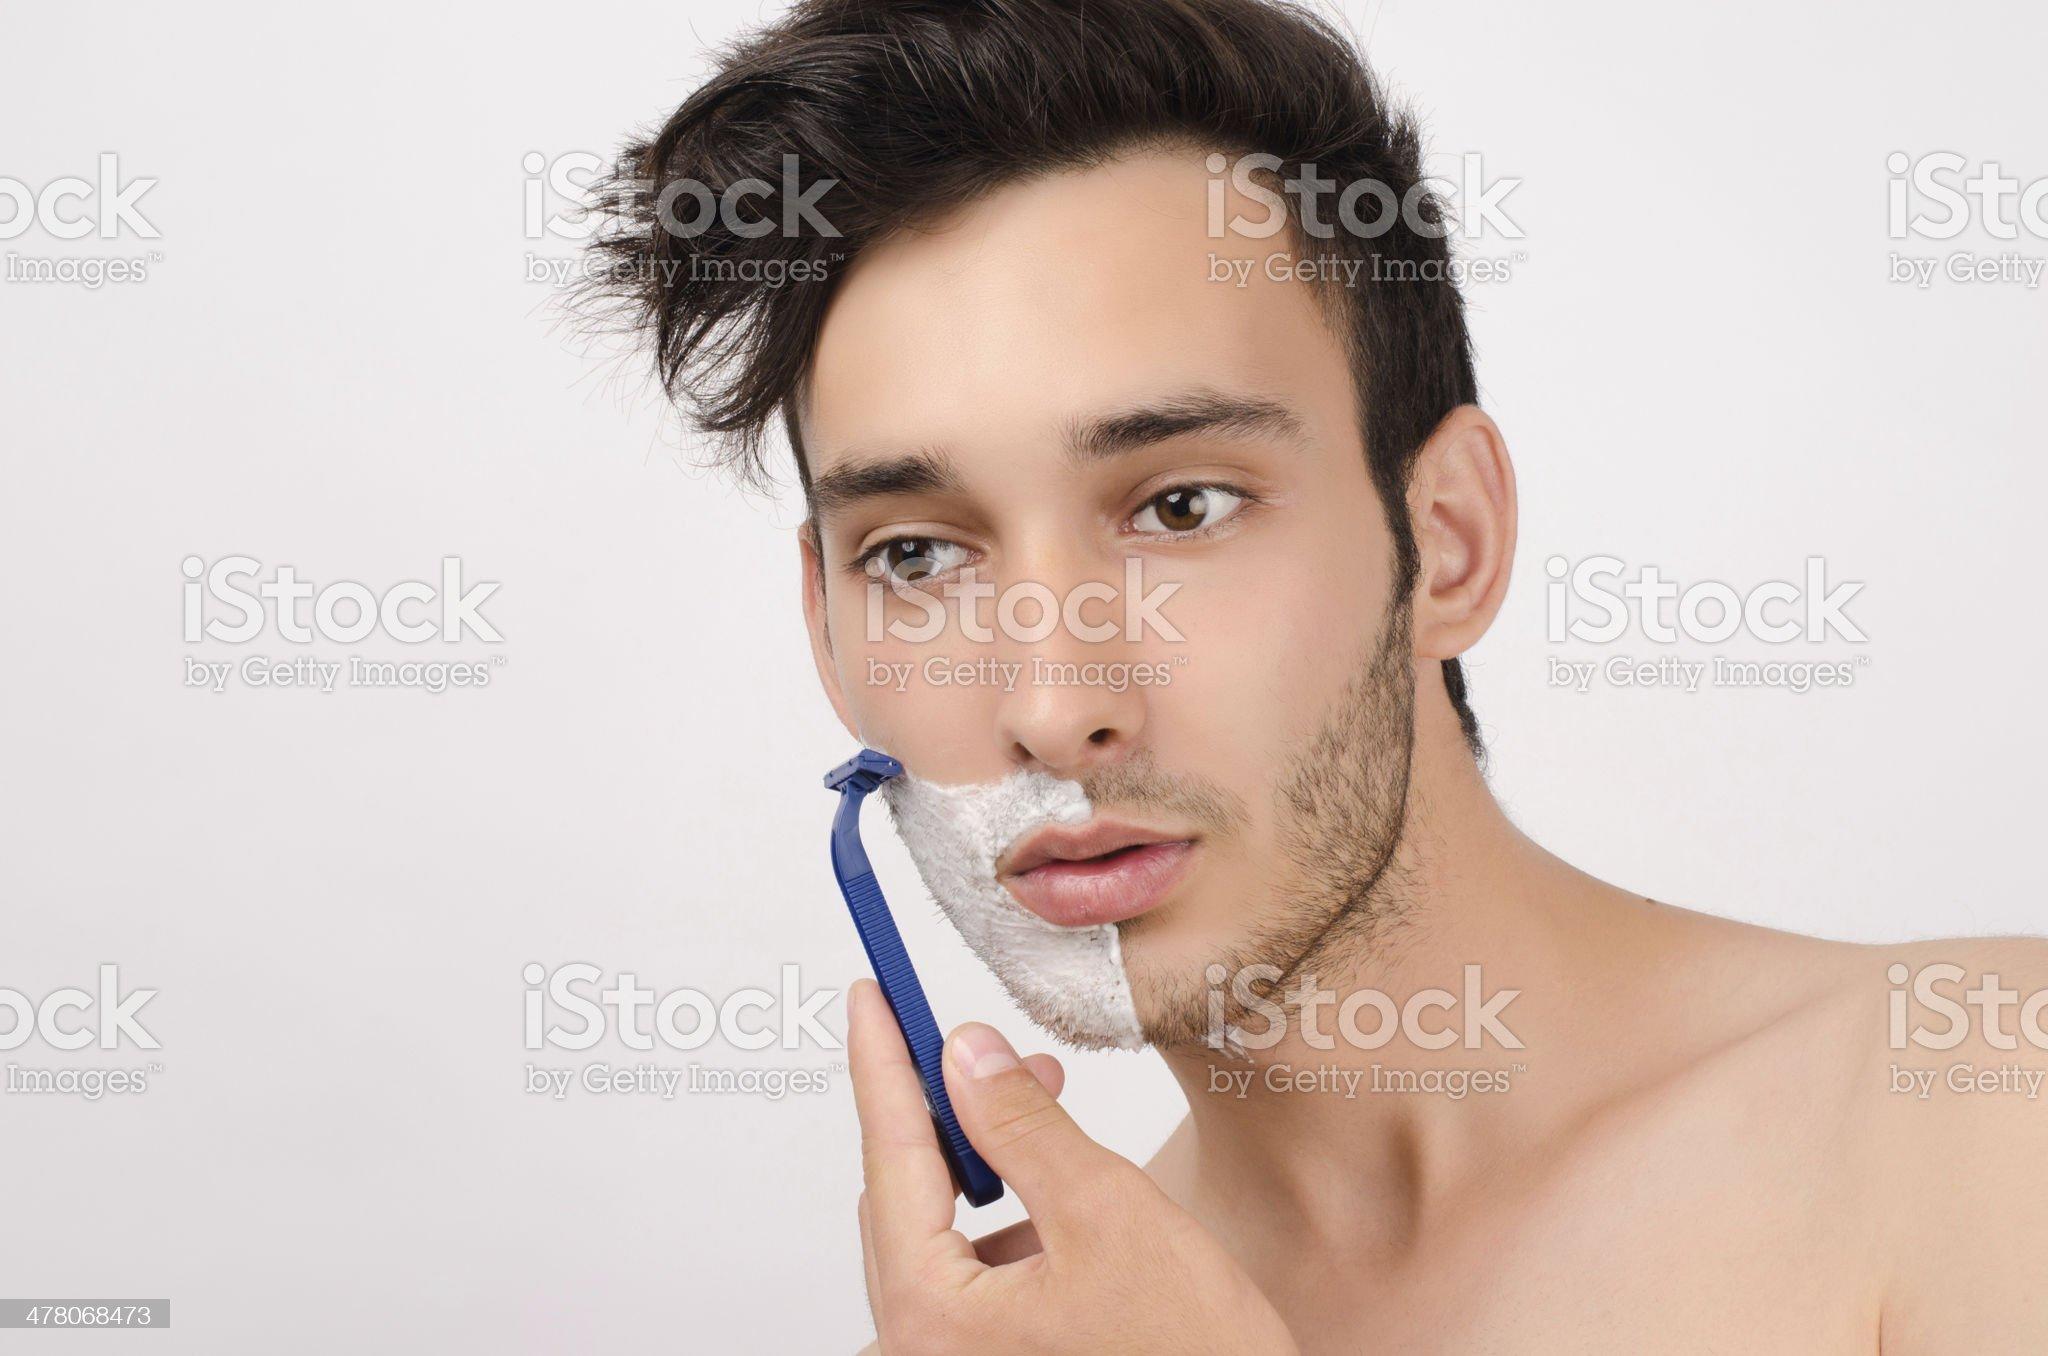 Young man shaving his beard royalty-free stock photo